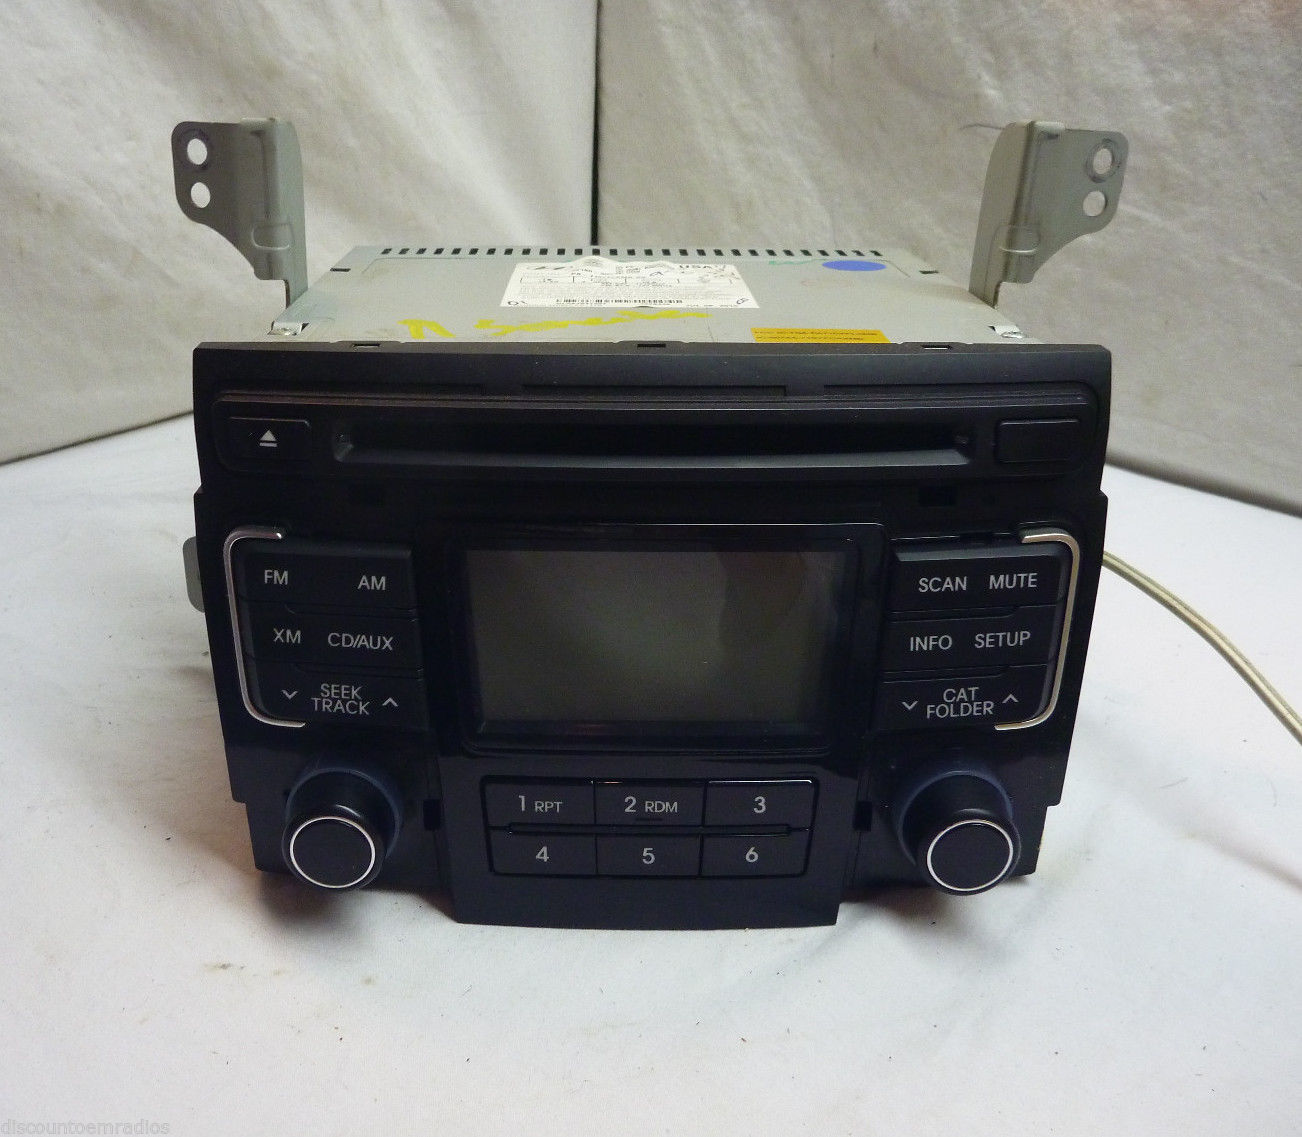 11 12 Hyundai Sonata Radio Cd Mp3 Player 96180-3Q000 FG41